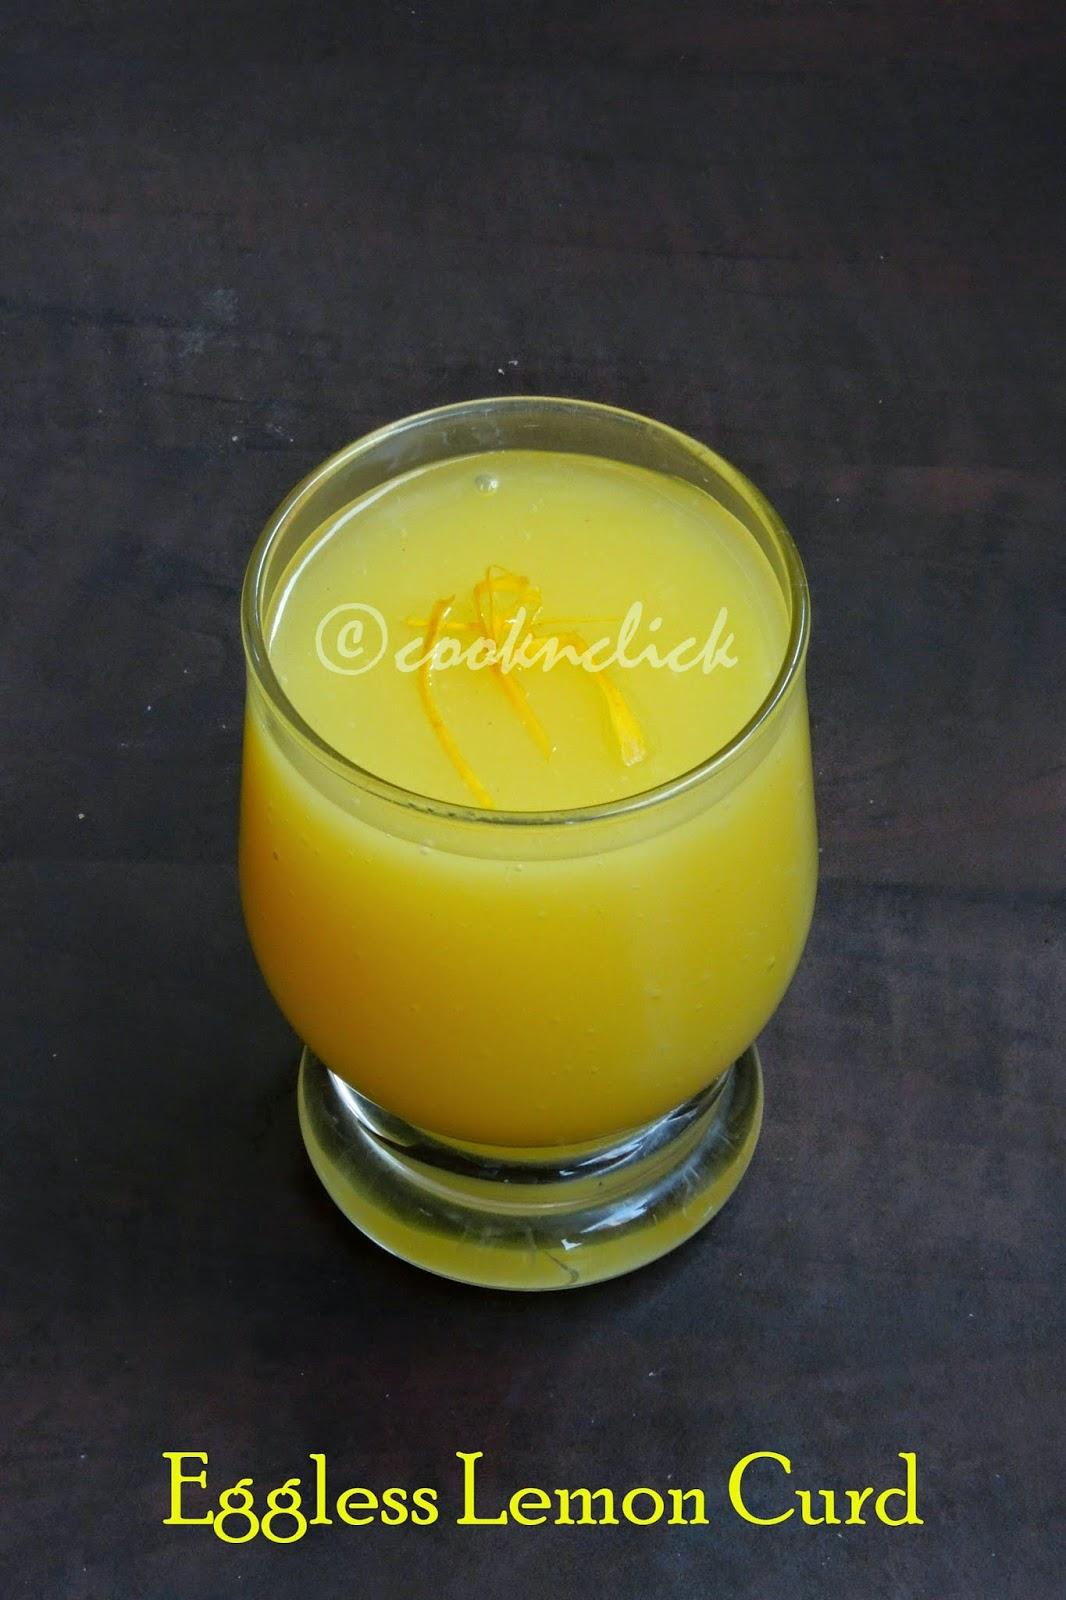 Eggless lemon curd,lemon curd